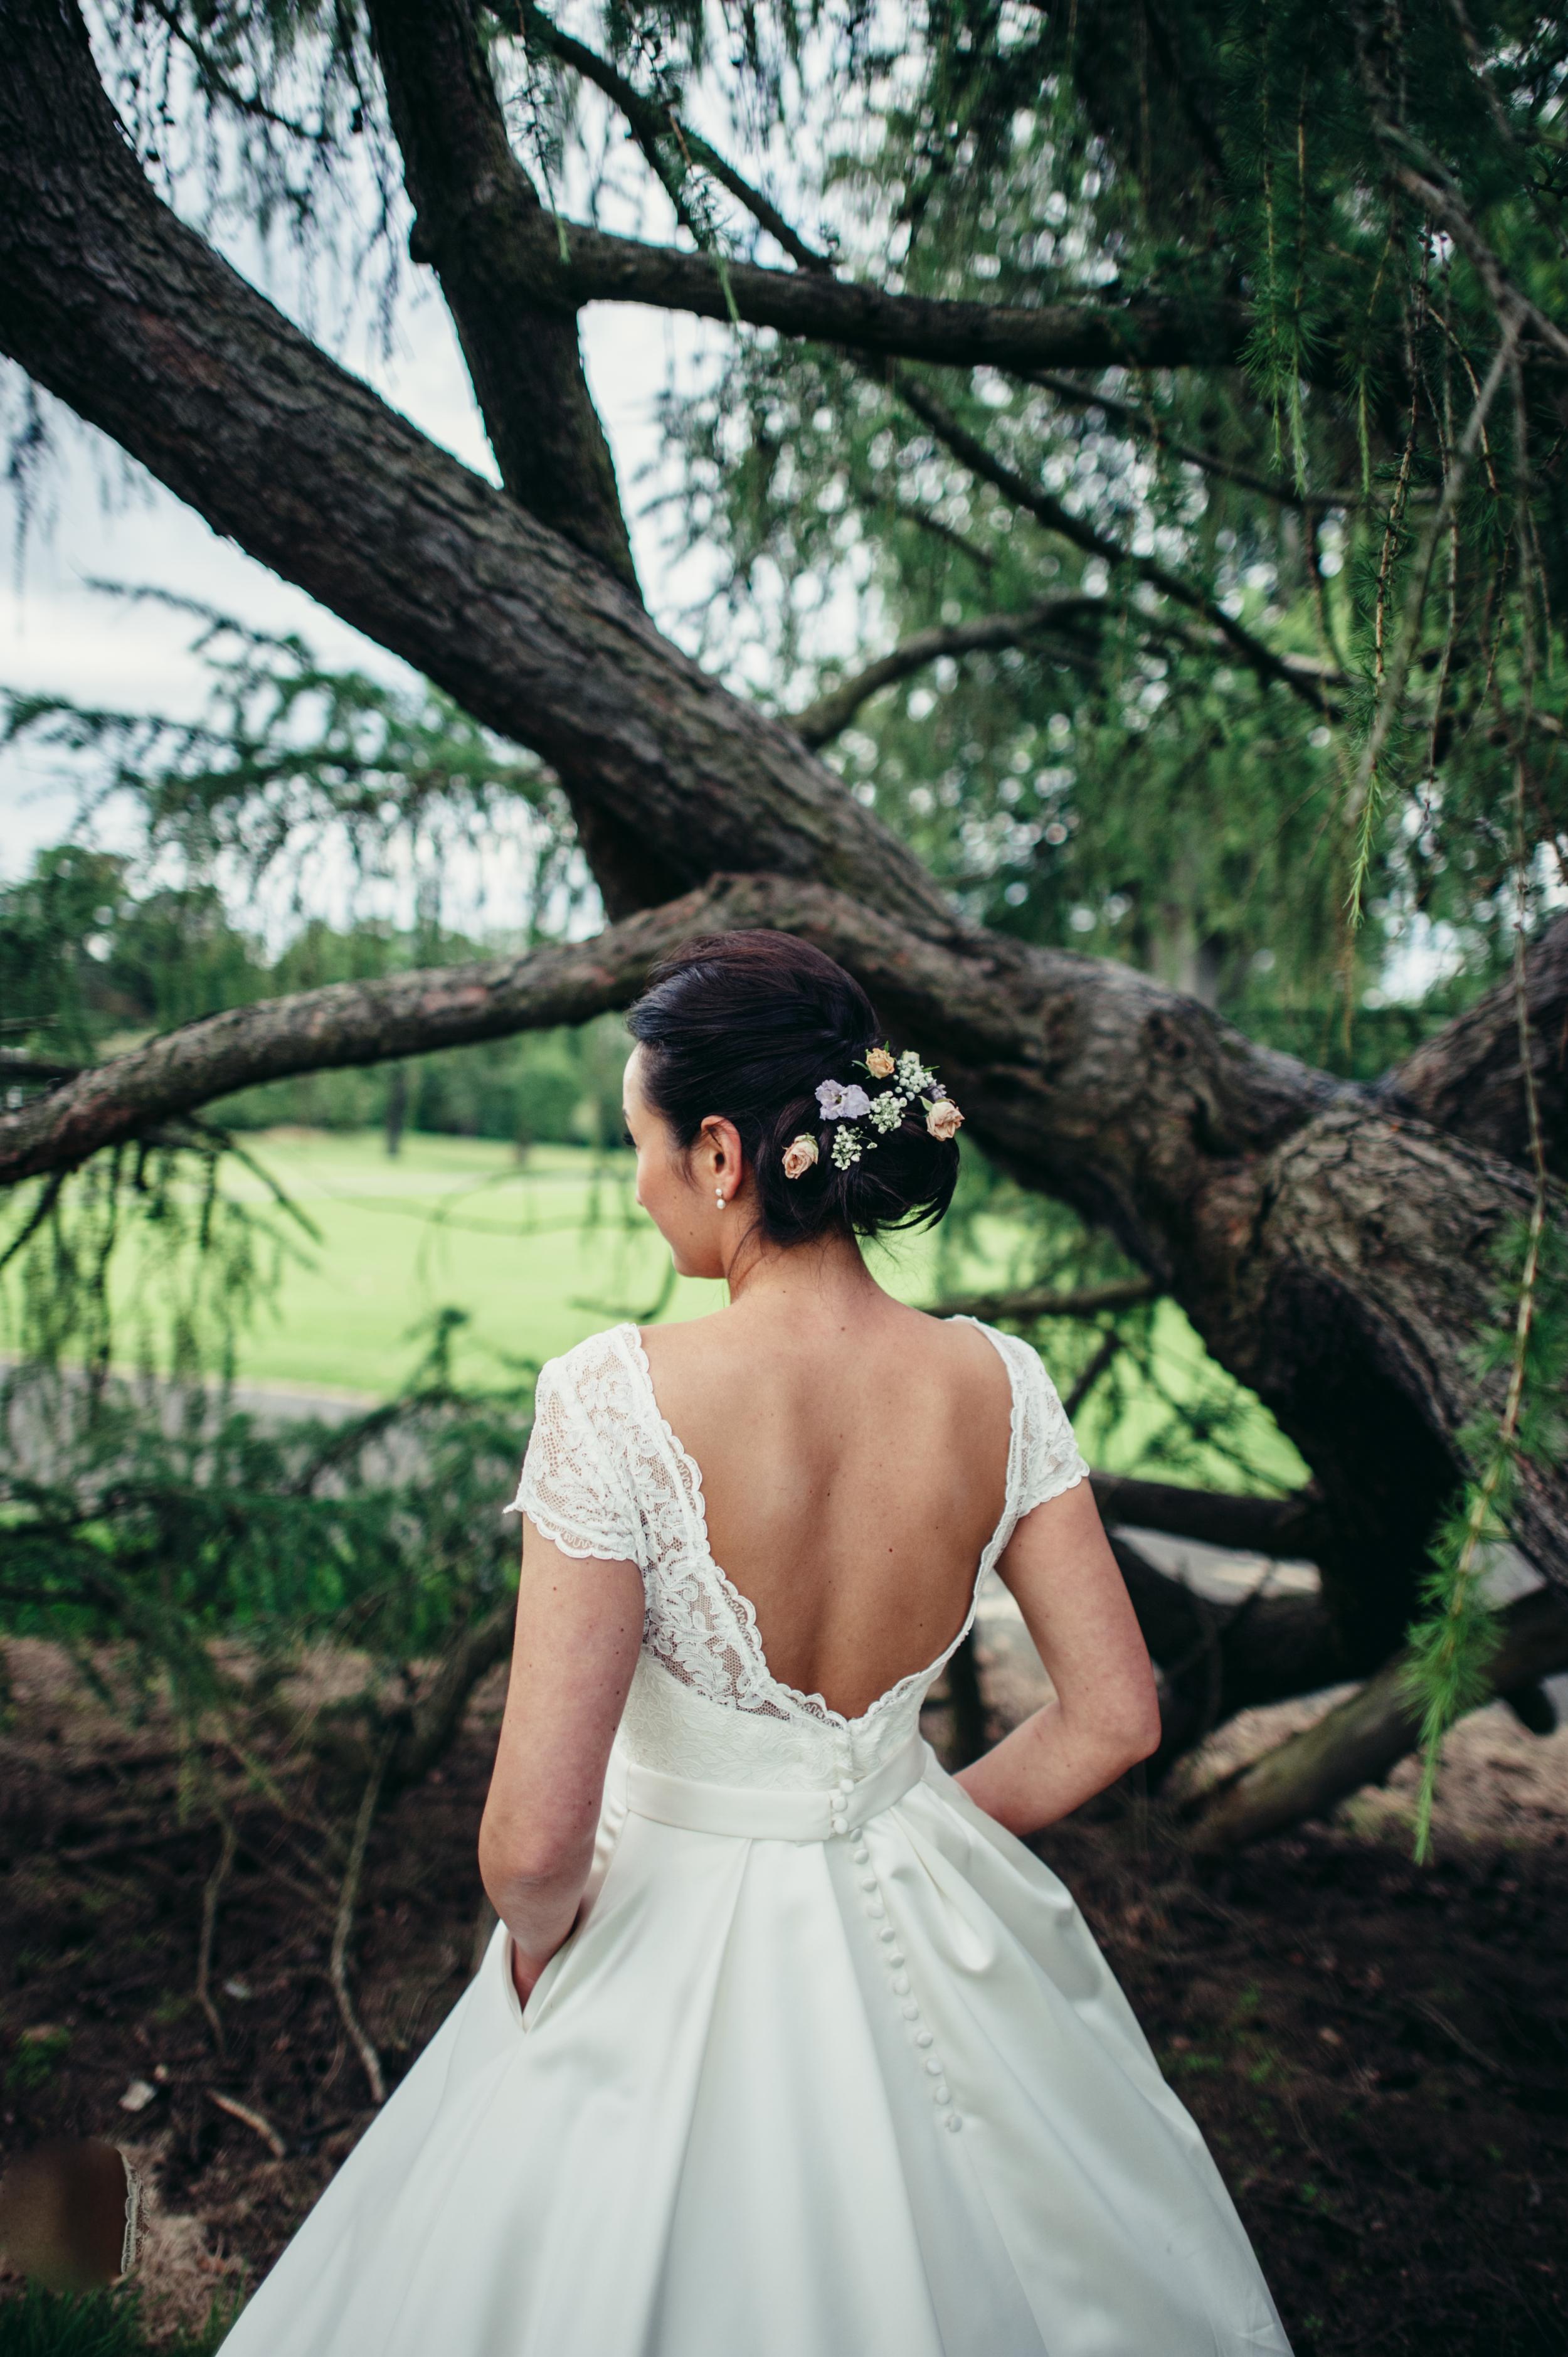 0175-lisa-devine-alternative-creative-wedding-photography-glasgow-edinburgh.JPG